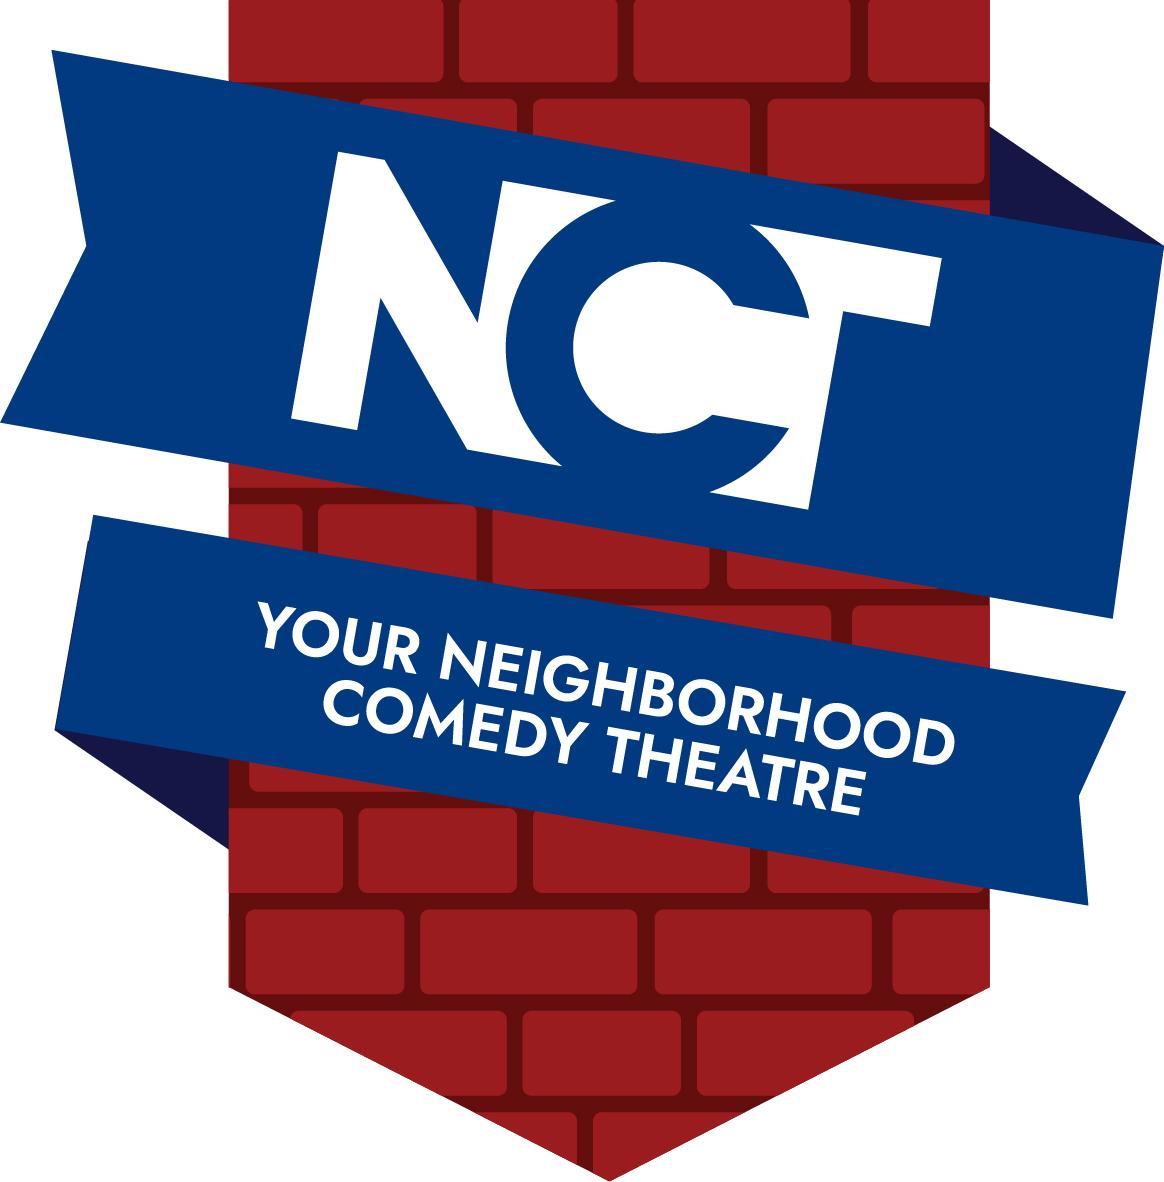 Neighborhood Comedy Theatre